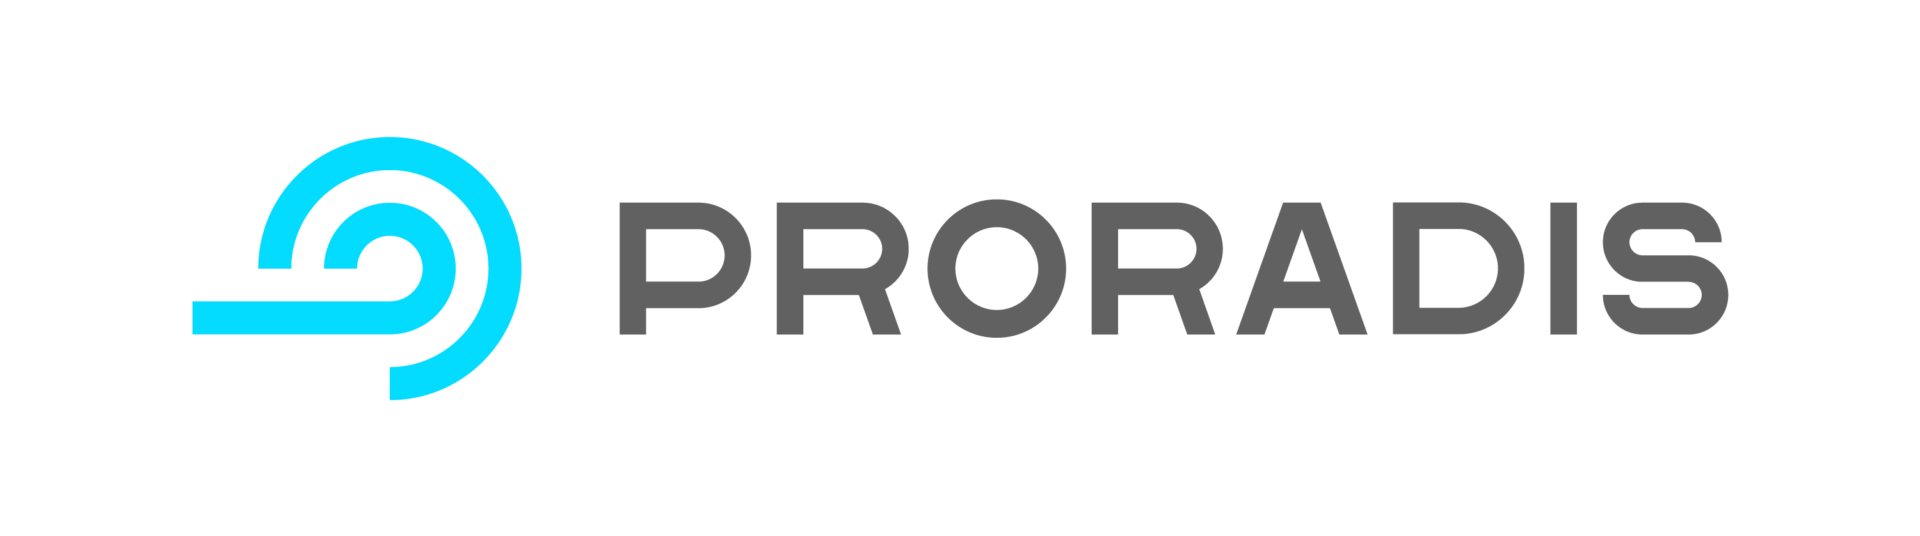 LOGO PRORADIS